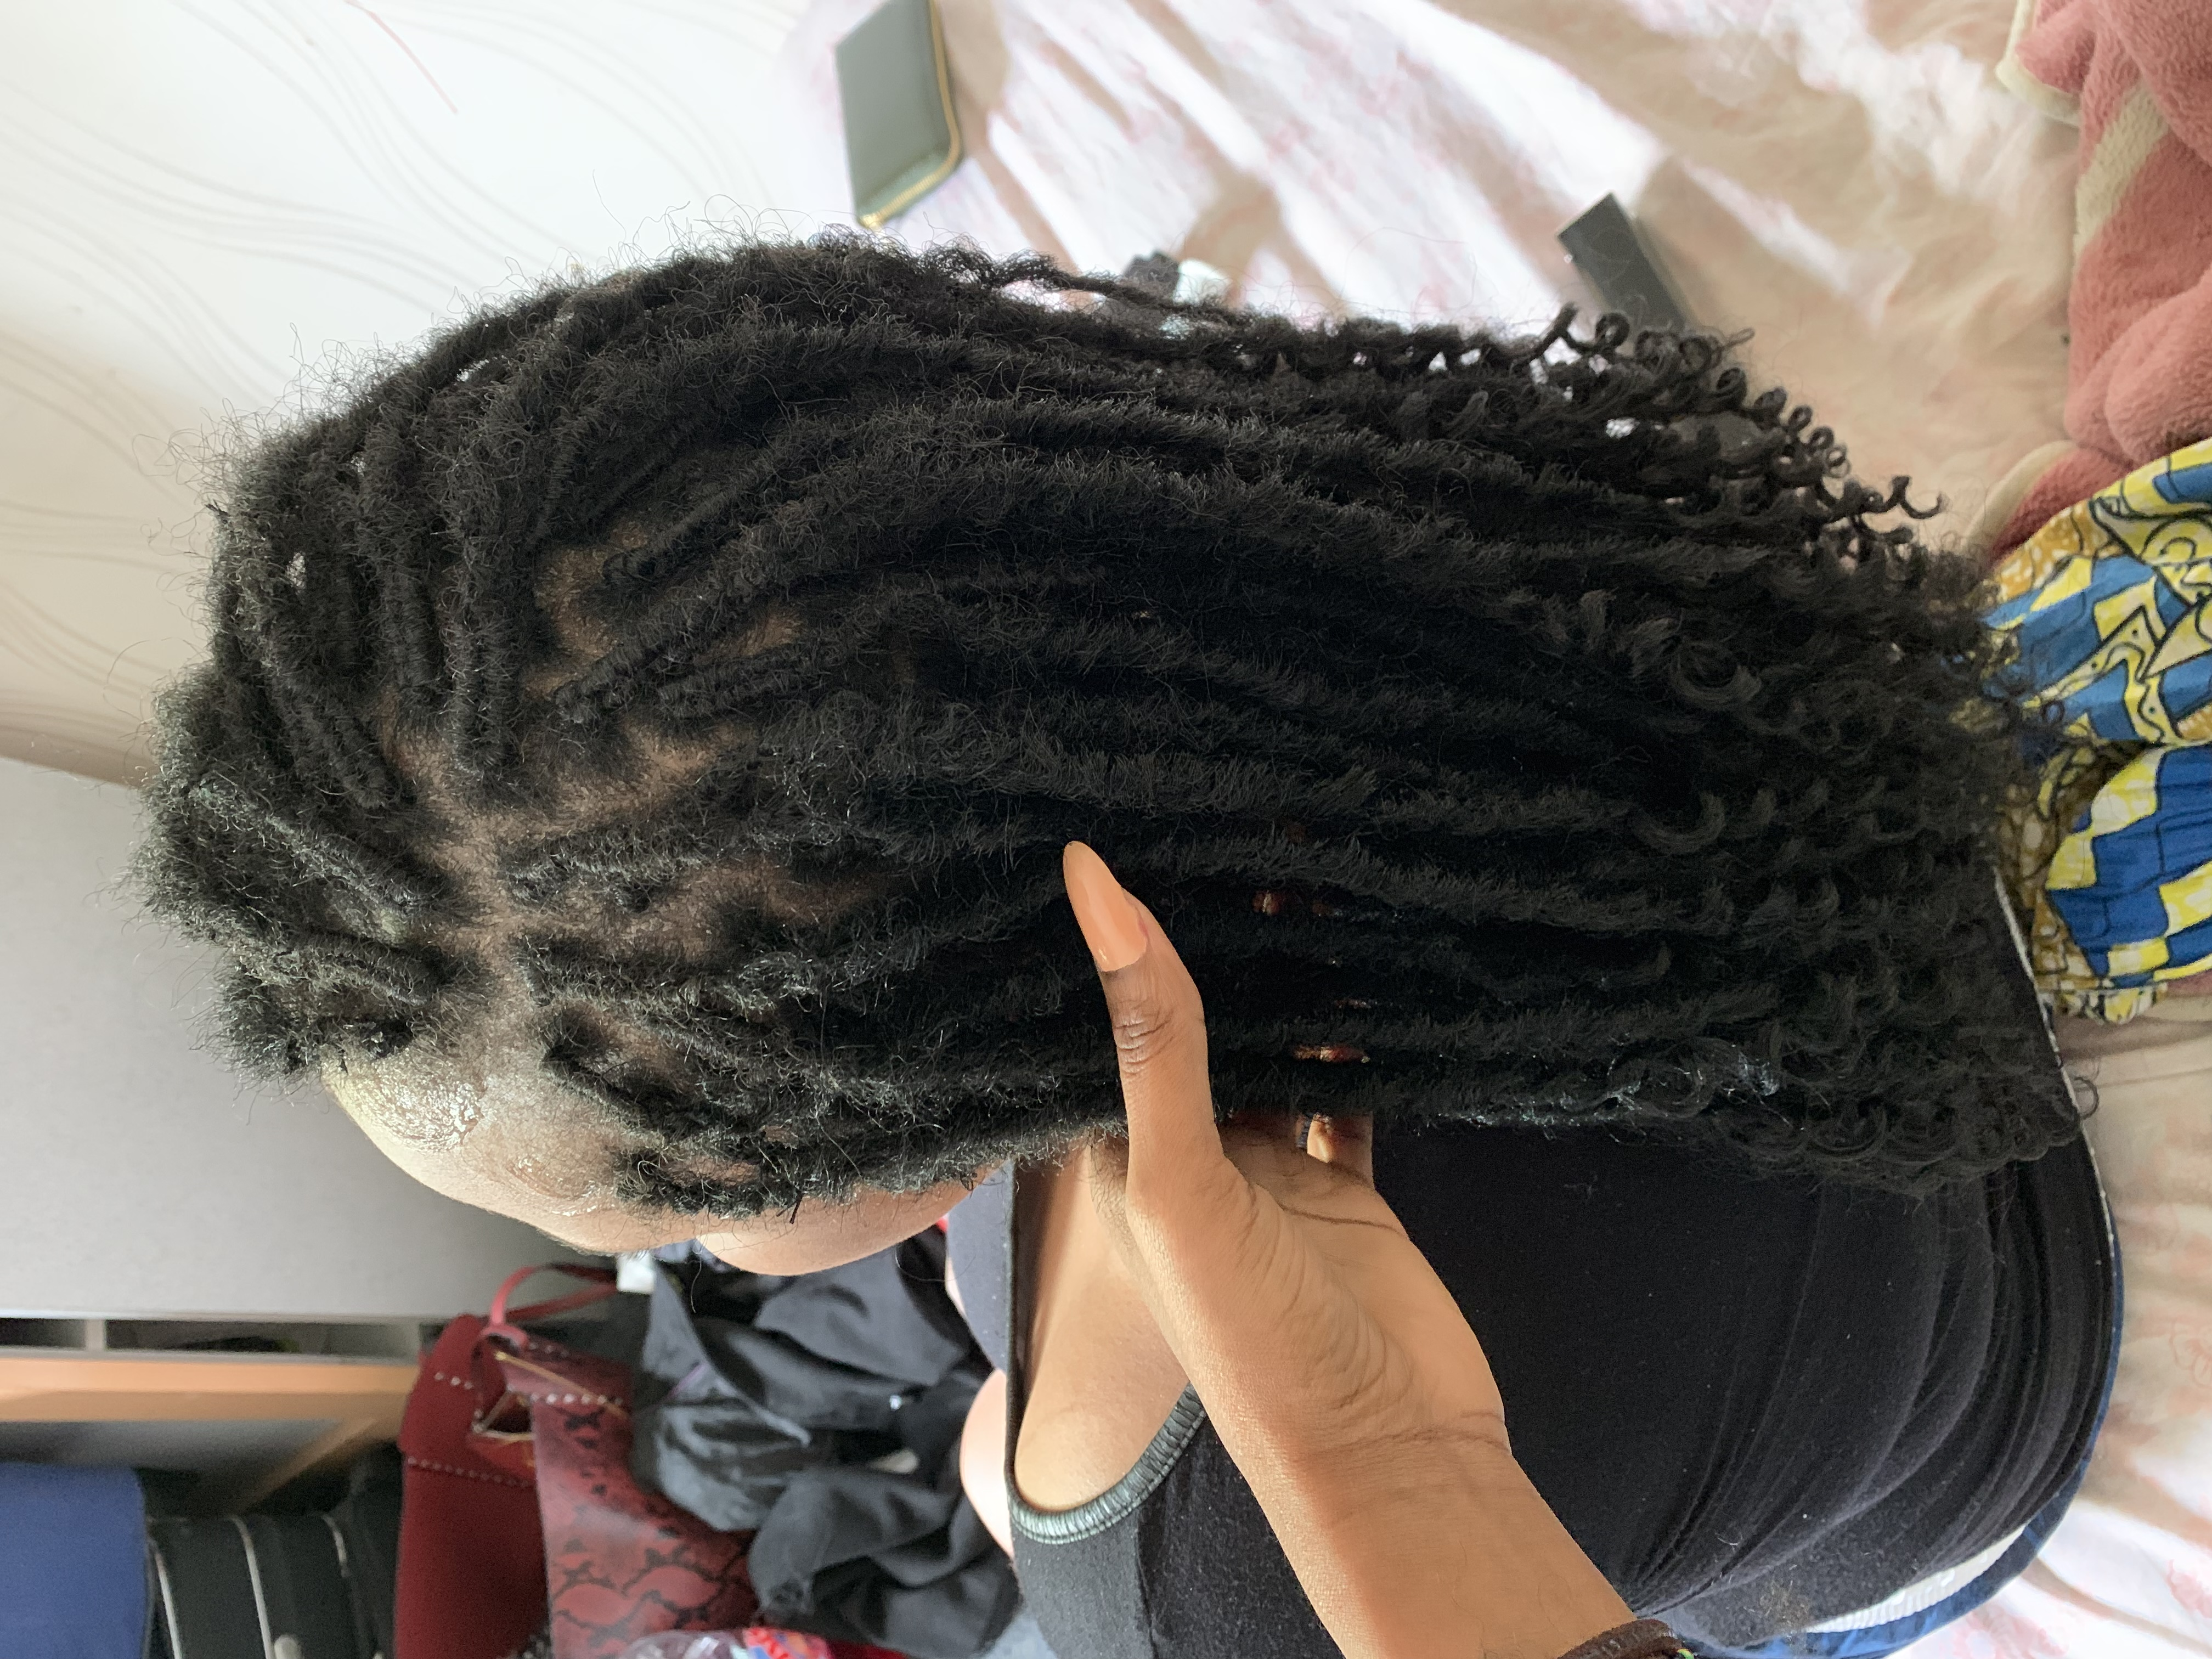 salon de coiffure afro tresse tresses box braids crochet braids vanilles tissages paris 75 77 78 91 92 93 94 95 OPYKCKSN